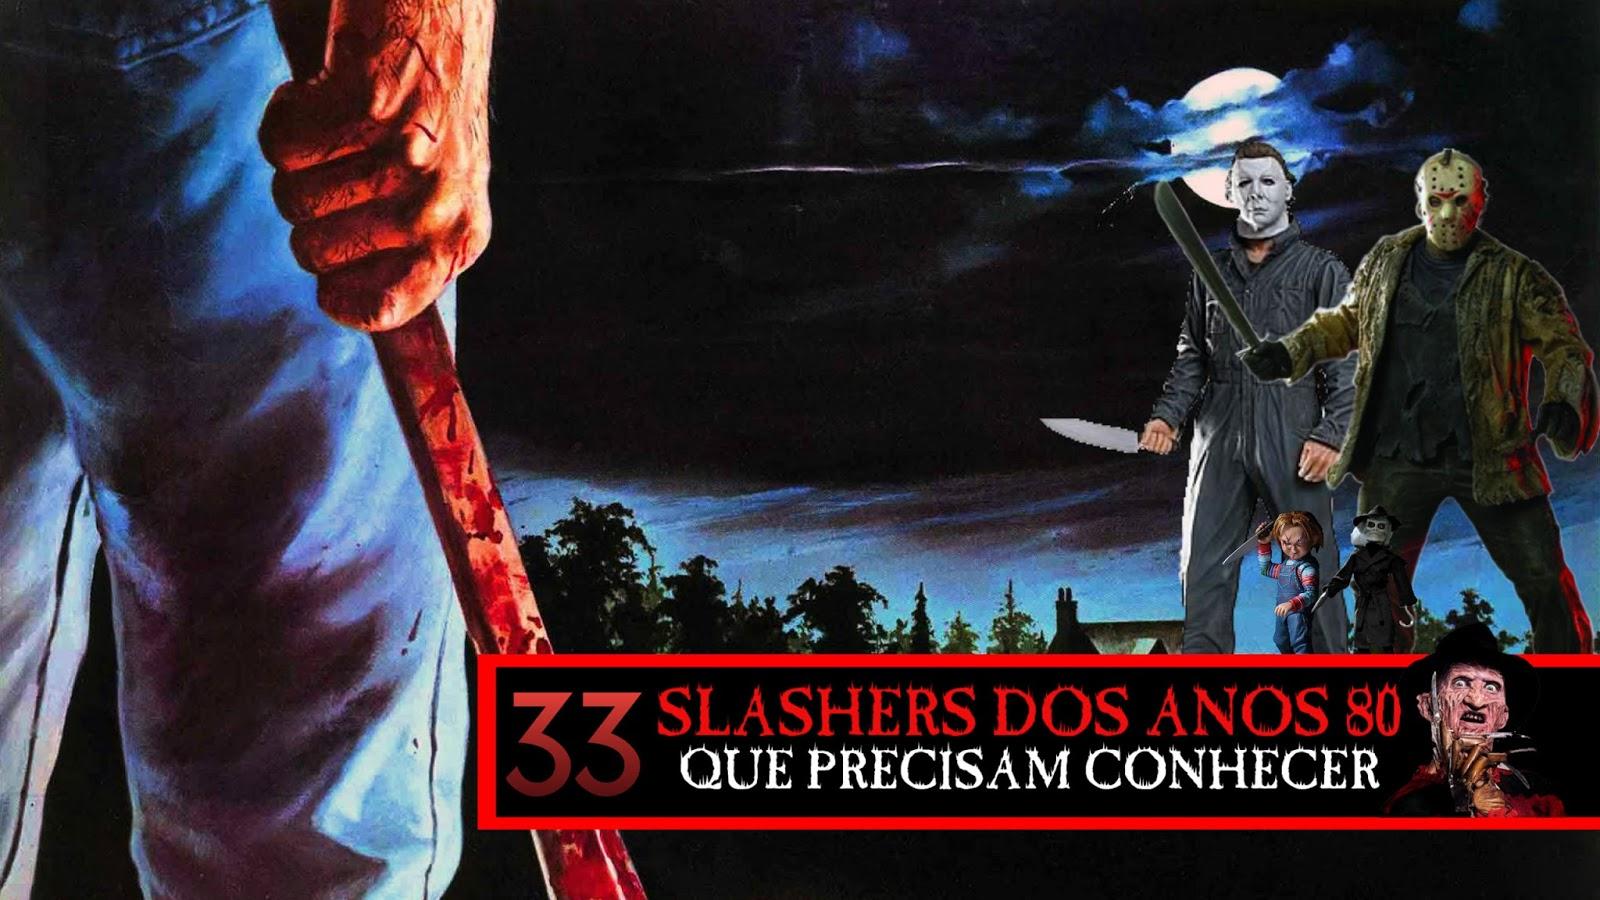 33-slashers-dos-anos-80-imperdiveis